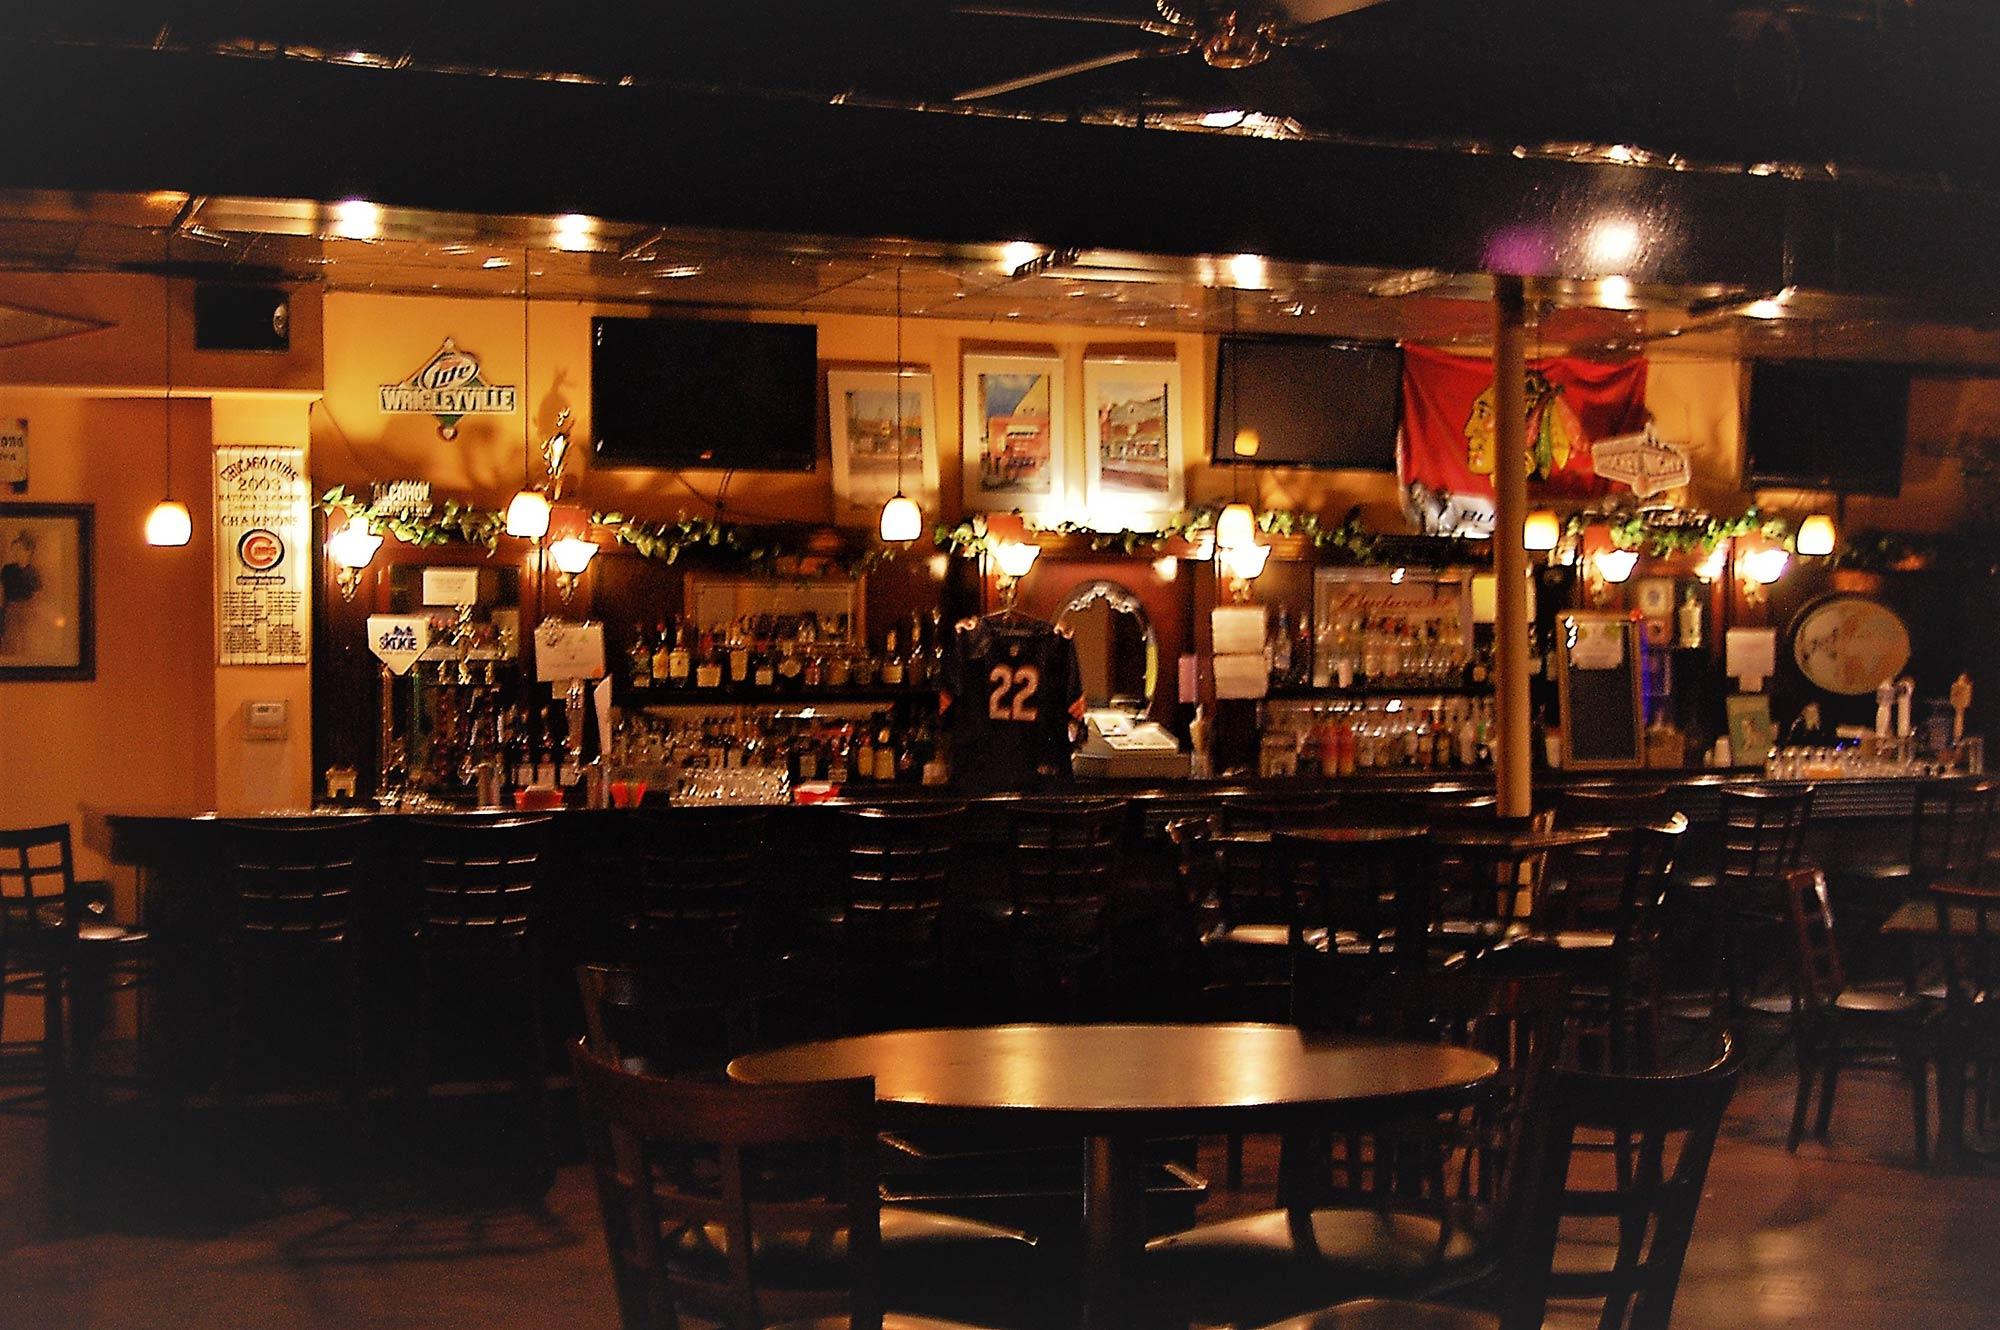 MCM-Pub-Grill-Image-1.jpg